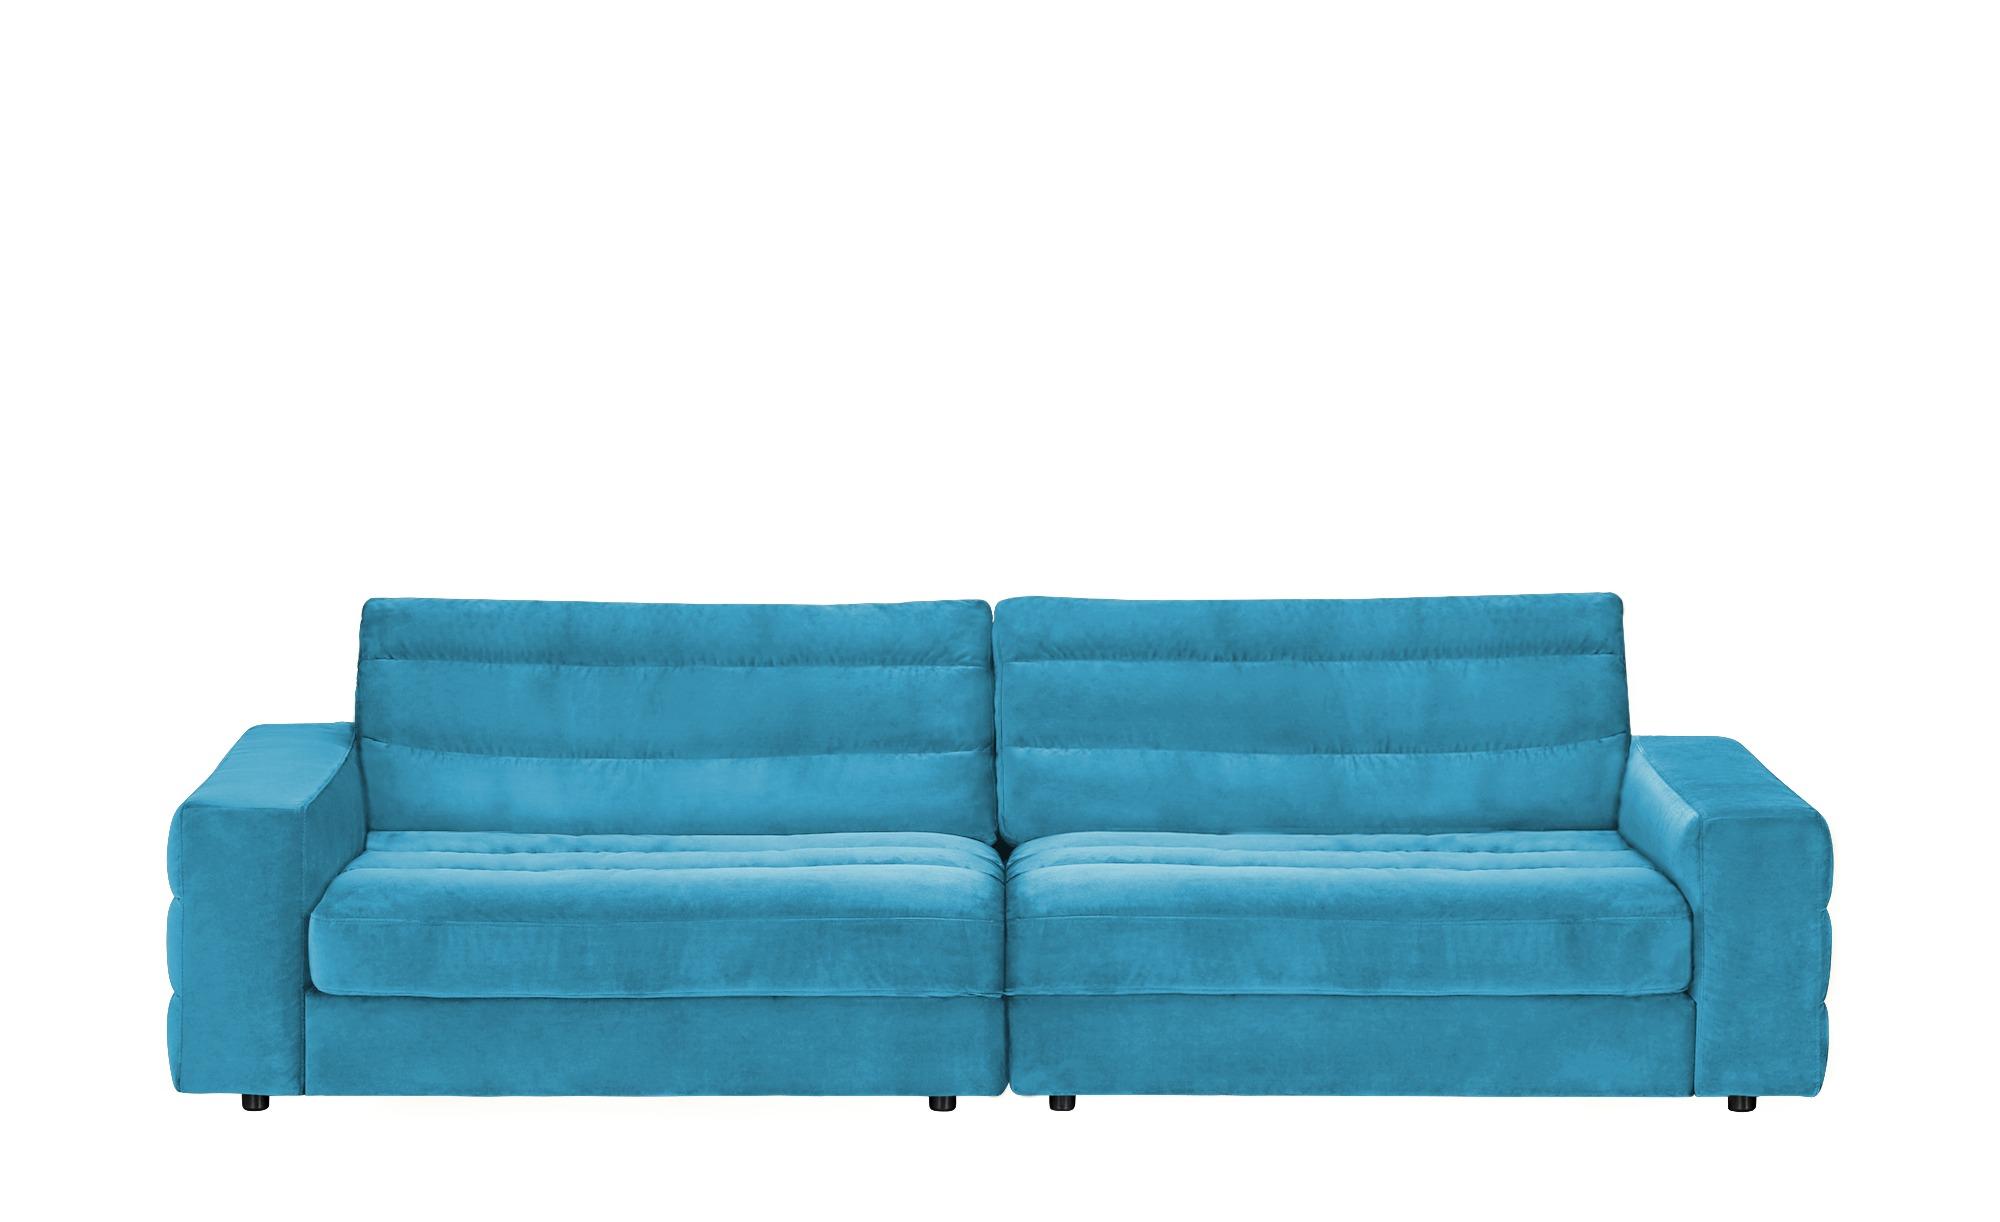 Big Sofa  Scarlatti ¦ türkis/petrol ¦ Maße (cm): B: 296 H: 83 T: 125 Polstermöbel > Sofas > Big-Sofas - Höffner